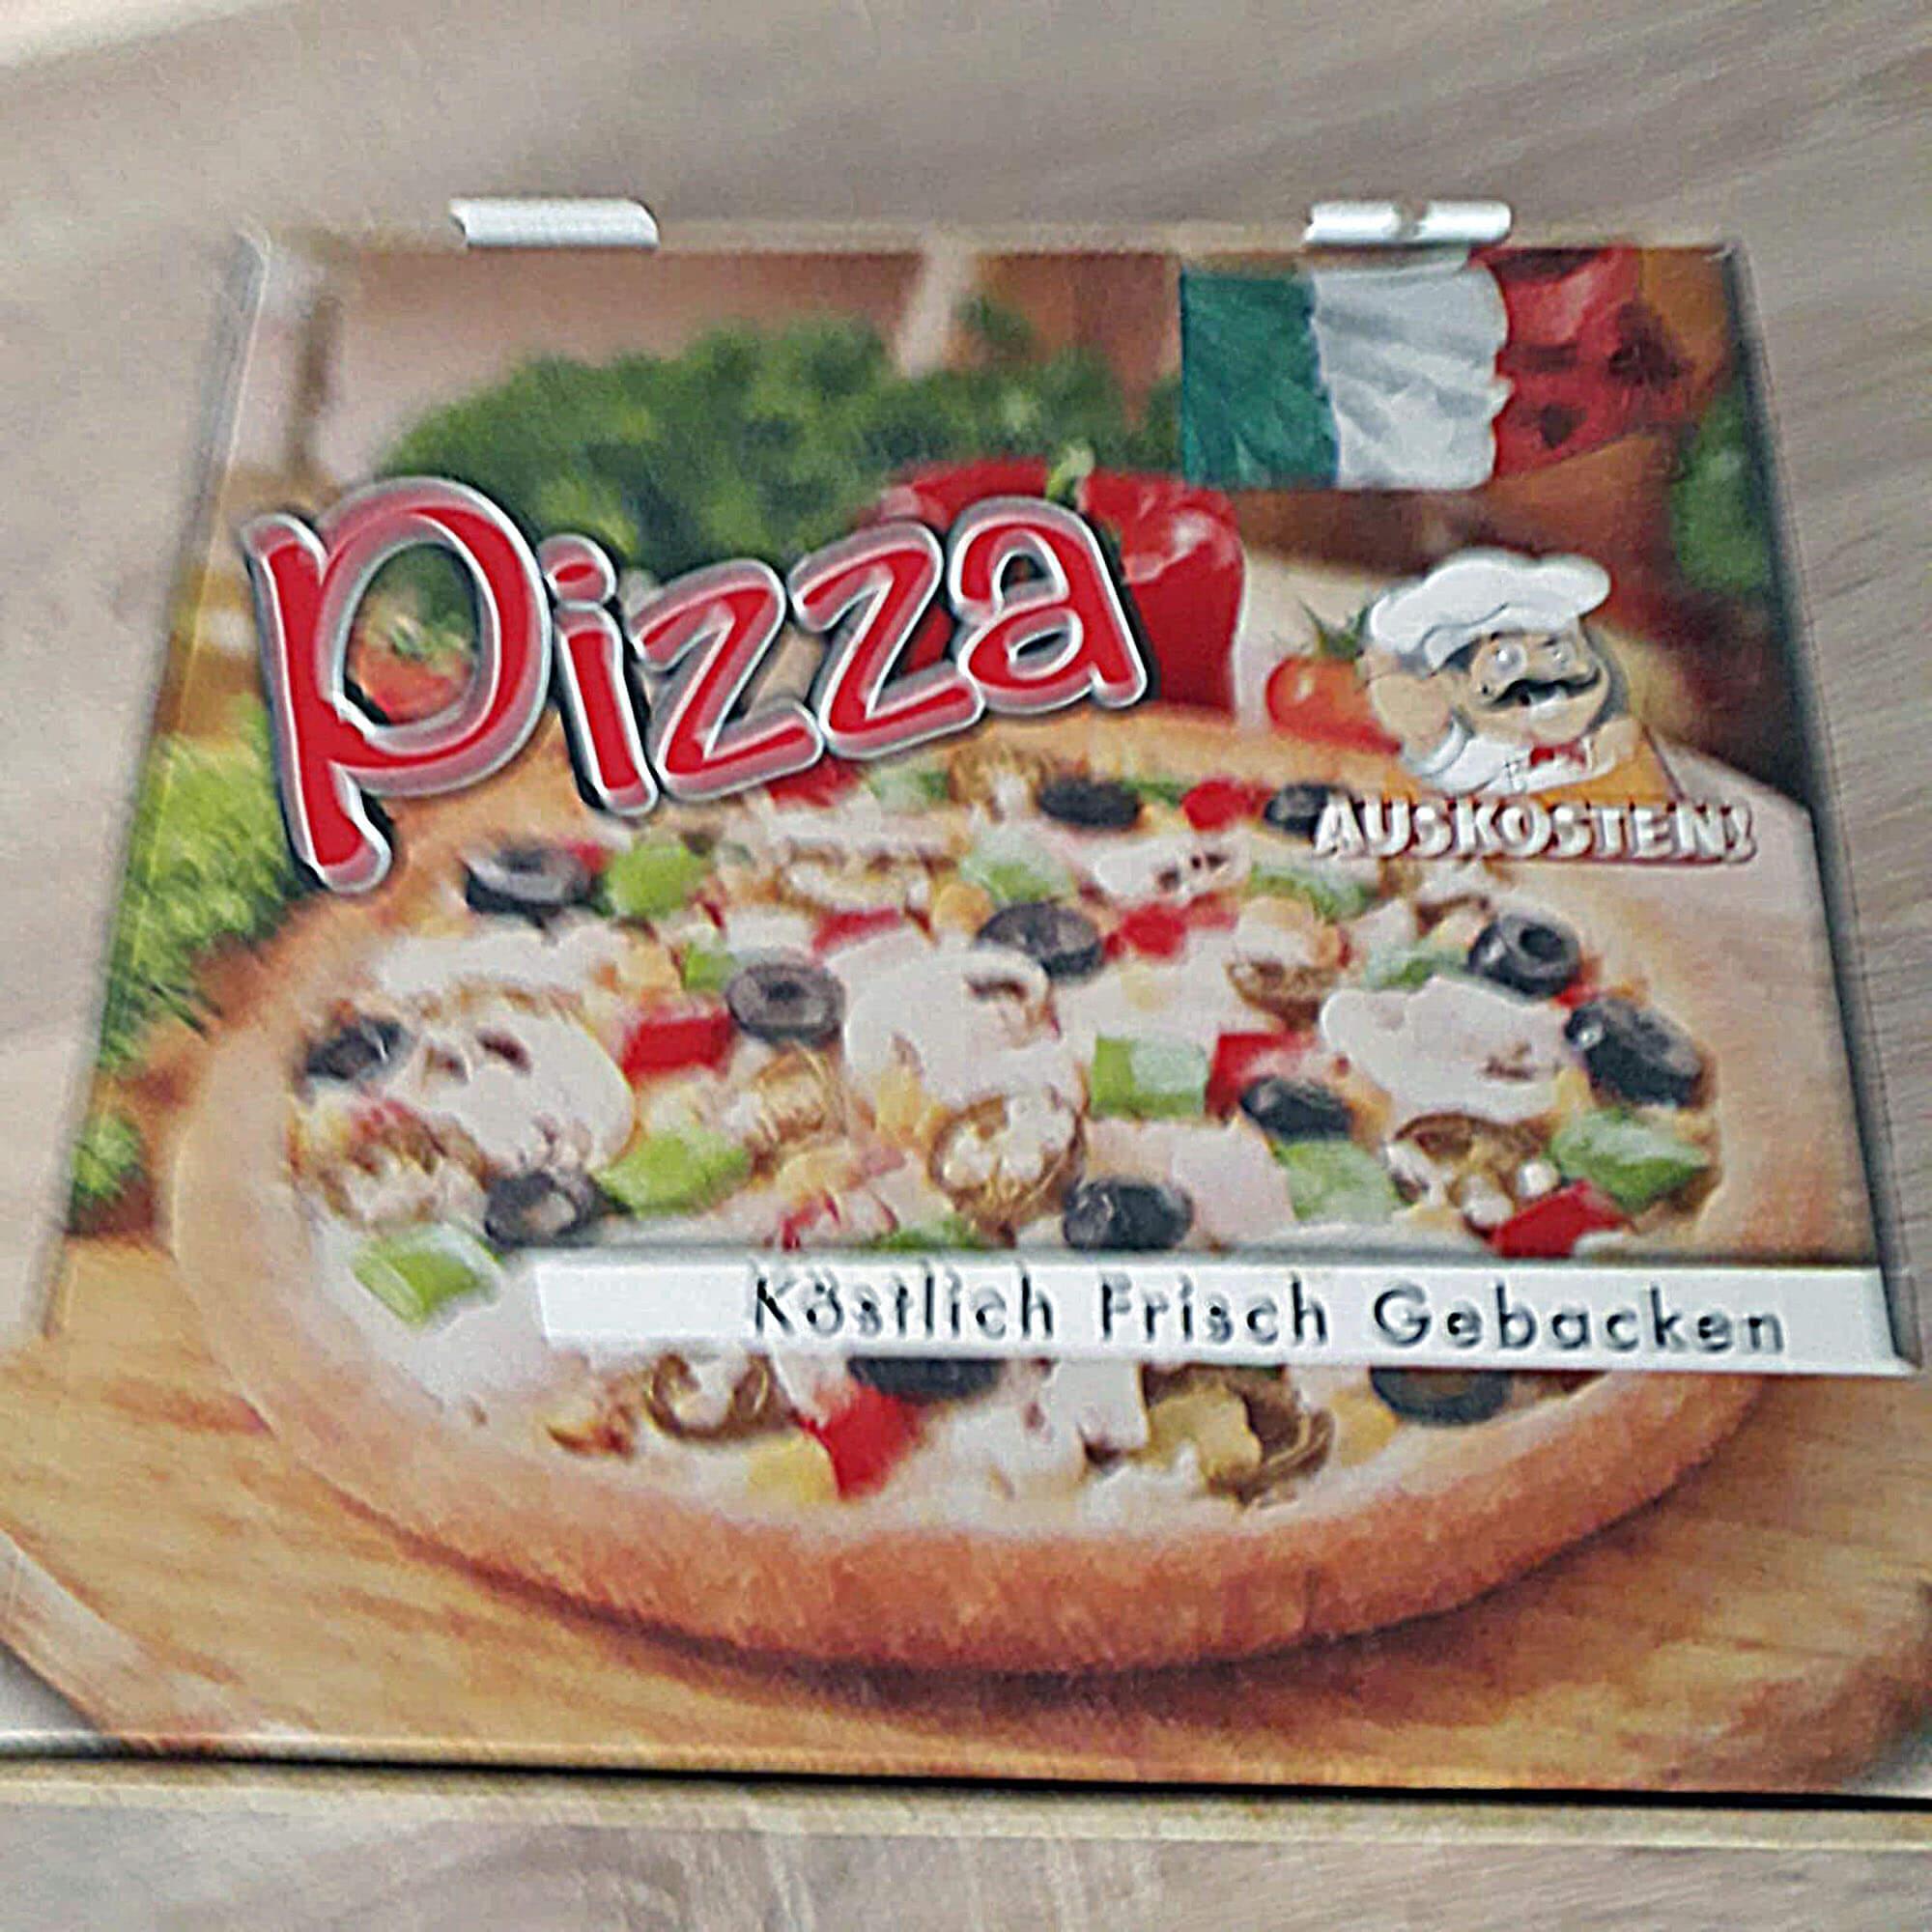 20c Pizzakarton, R.Koss #tagdernachbarn